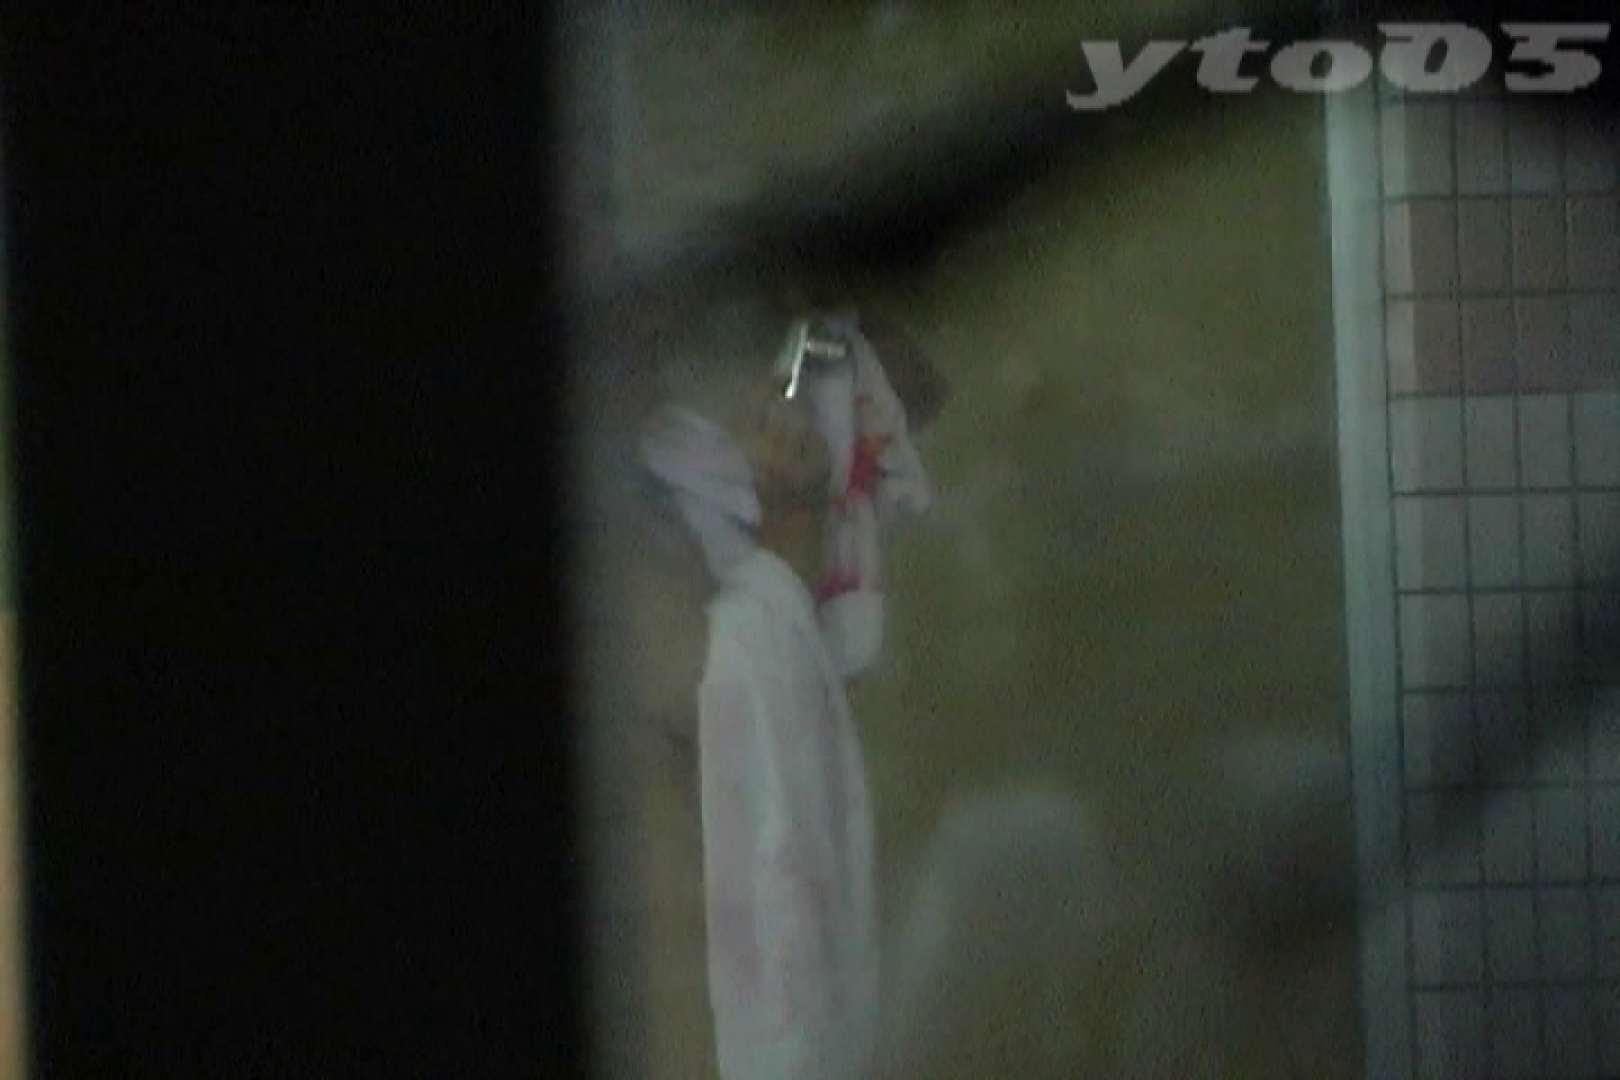 ▲復活限定▲合宿ホテル女風呂盗撮 Vol.31 期間限定 AV無料 85pic 3